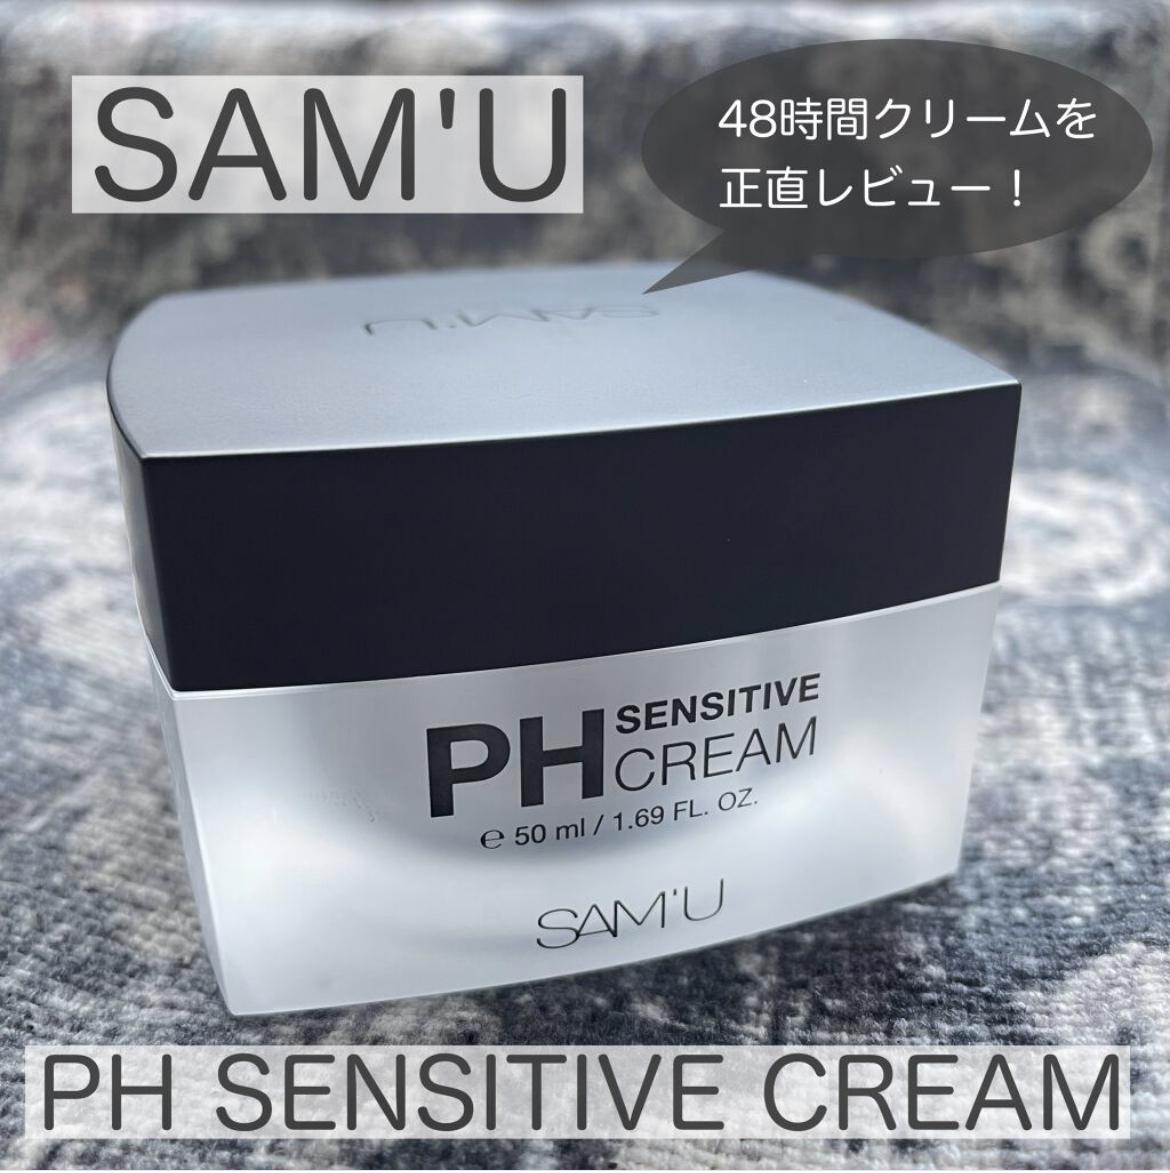 SAM'U(サミュ) PHセンシティブクリームを使ったけいさんのクチコミ画像1